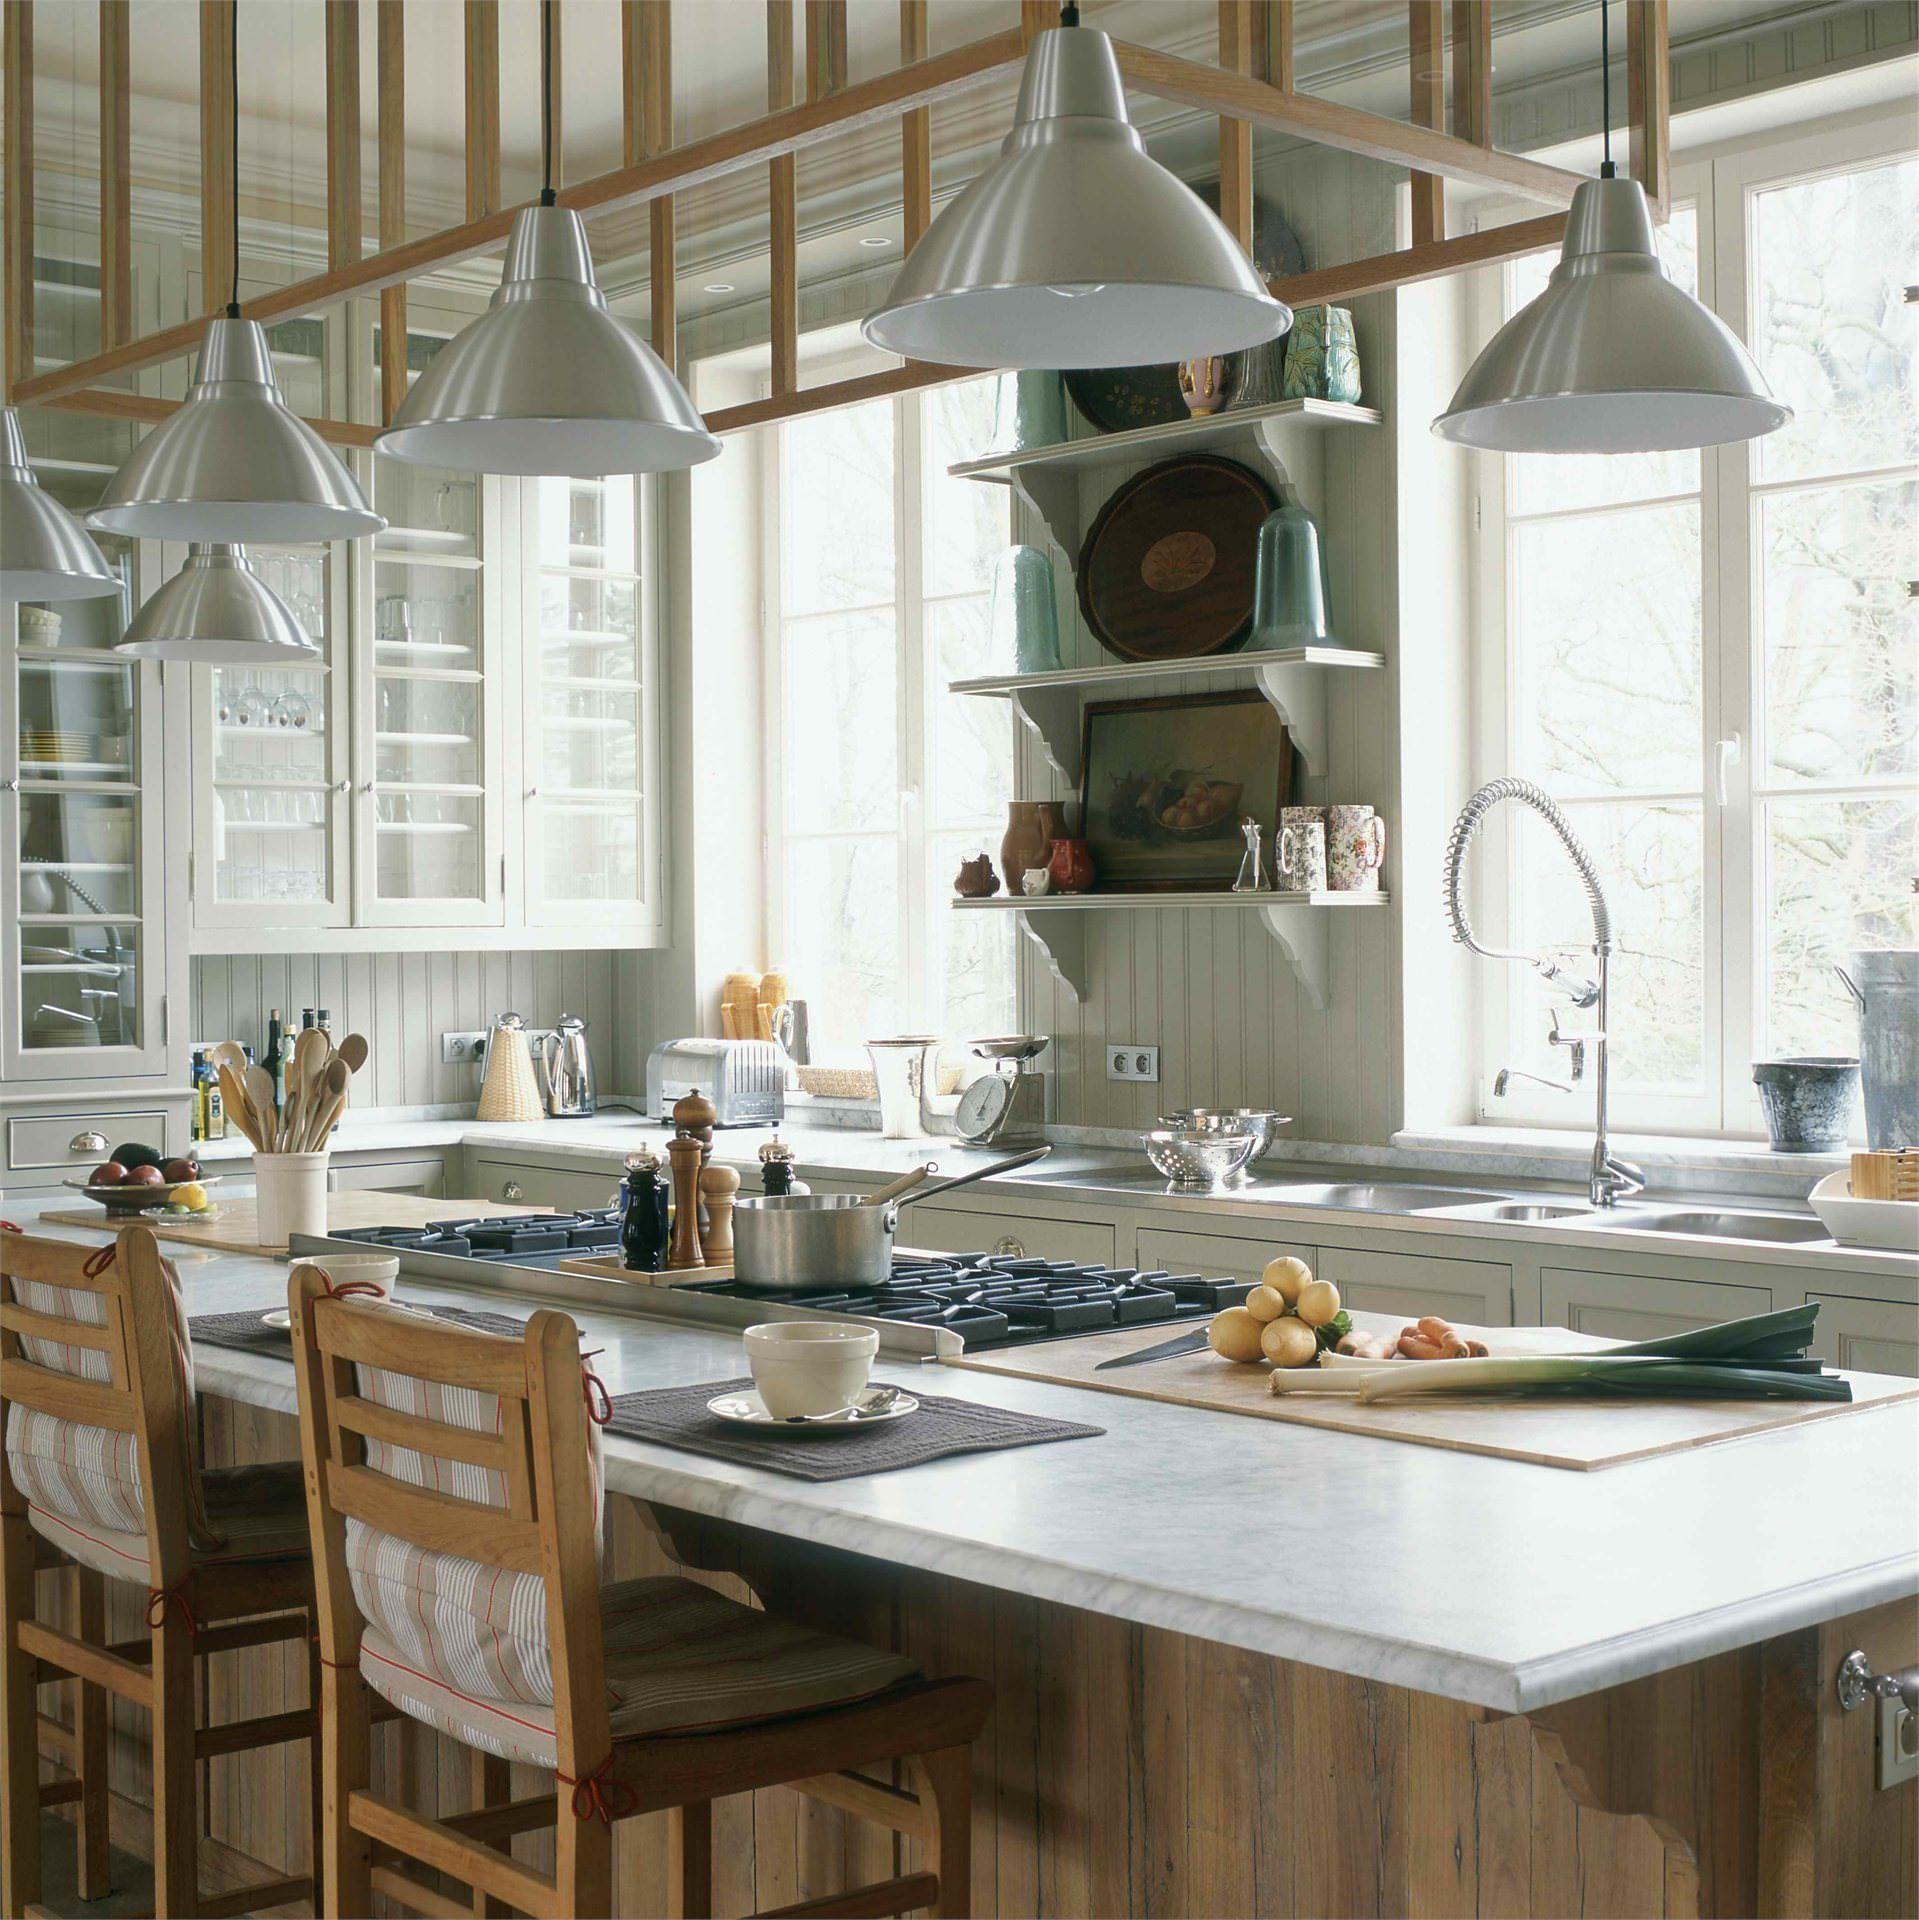 Ideal Comment Organiser Sa Cuisine Shots Jobzzuus Jobzzuus - Comment organiser sa cuisine